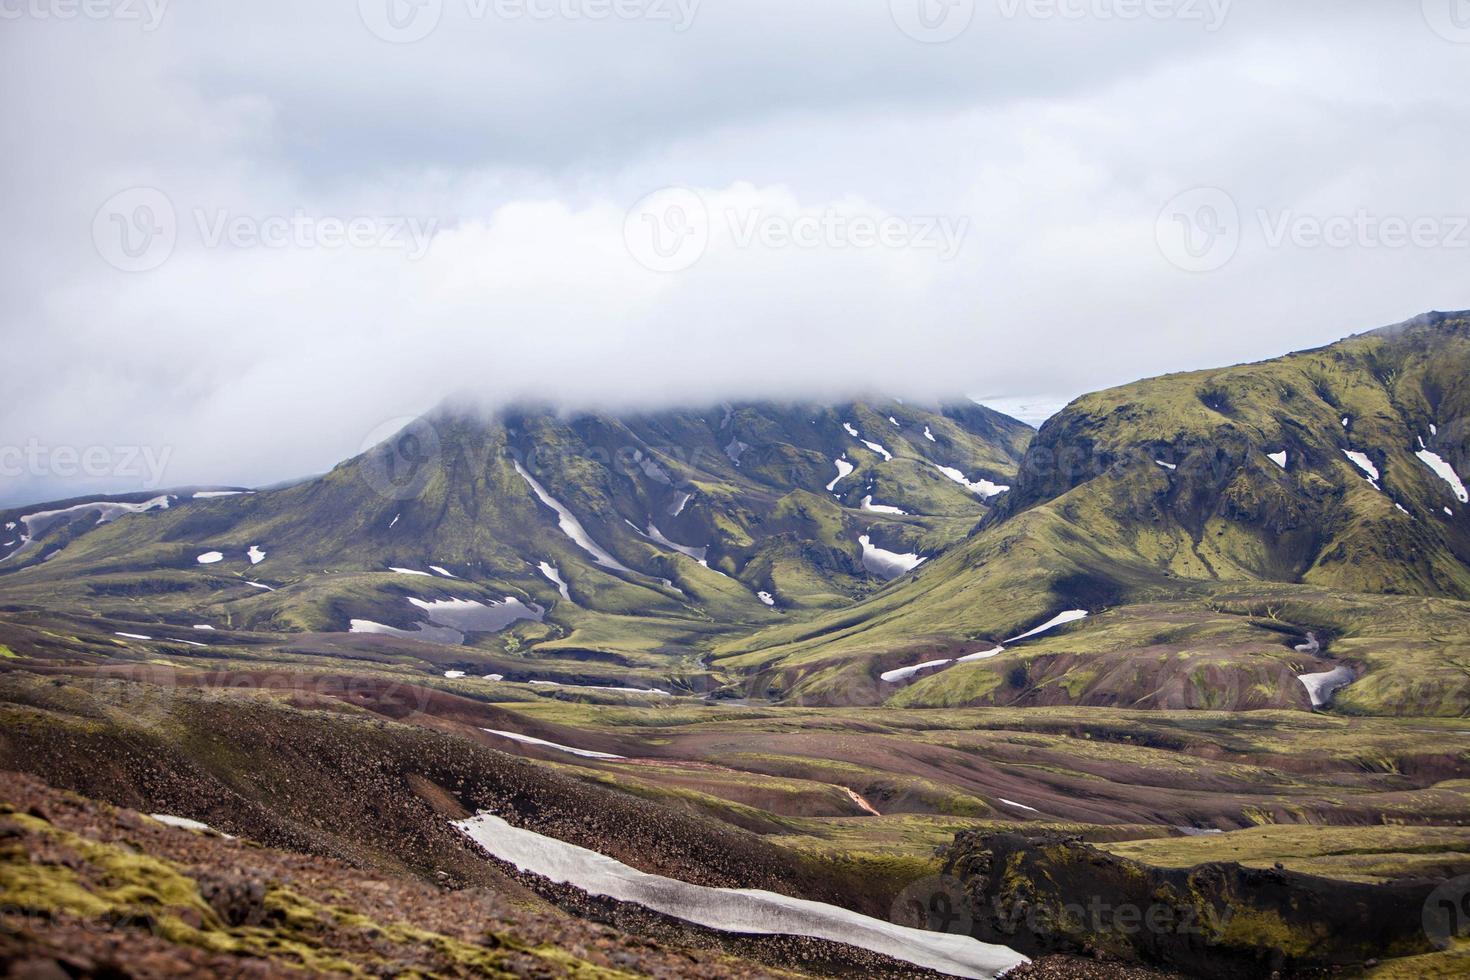 paesaggio vulcanico - landmannalaugar, islanda foto